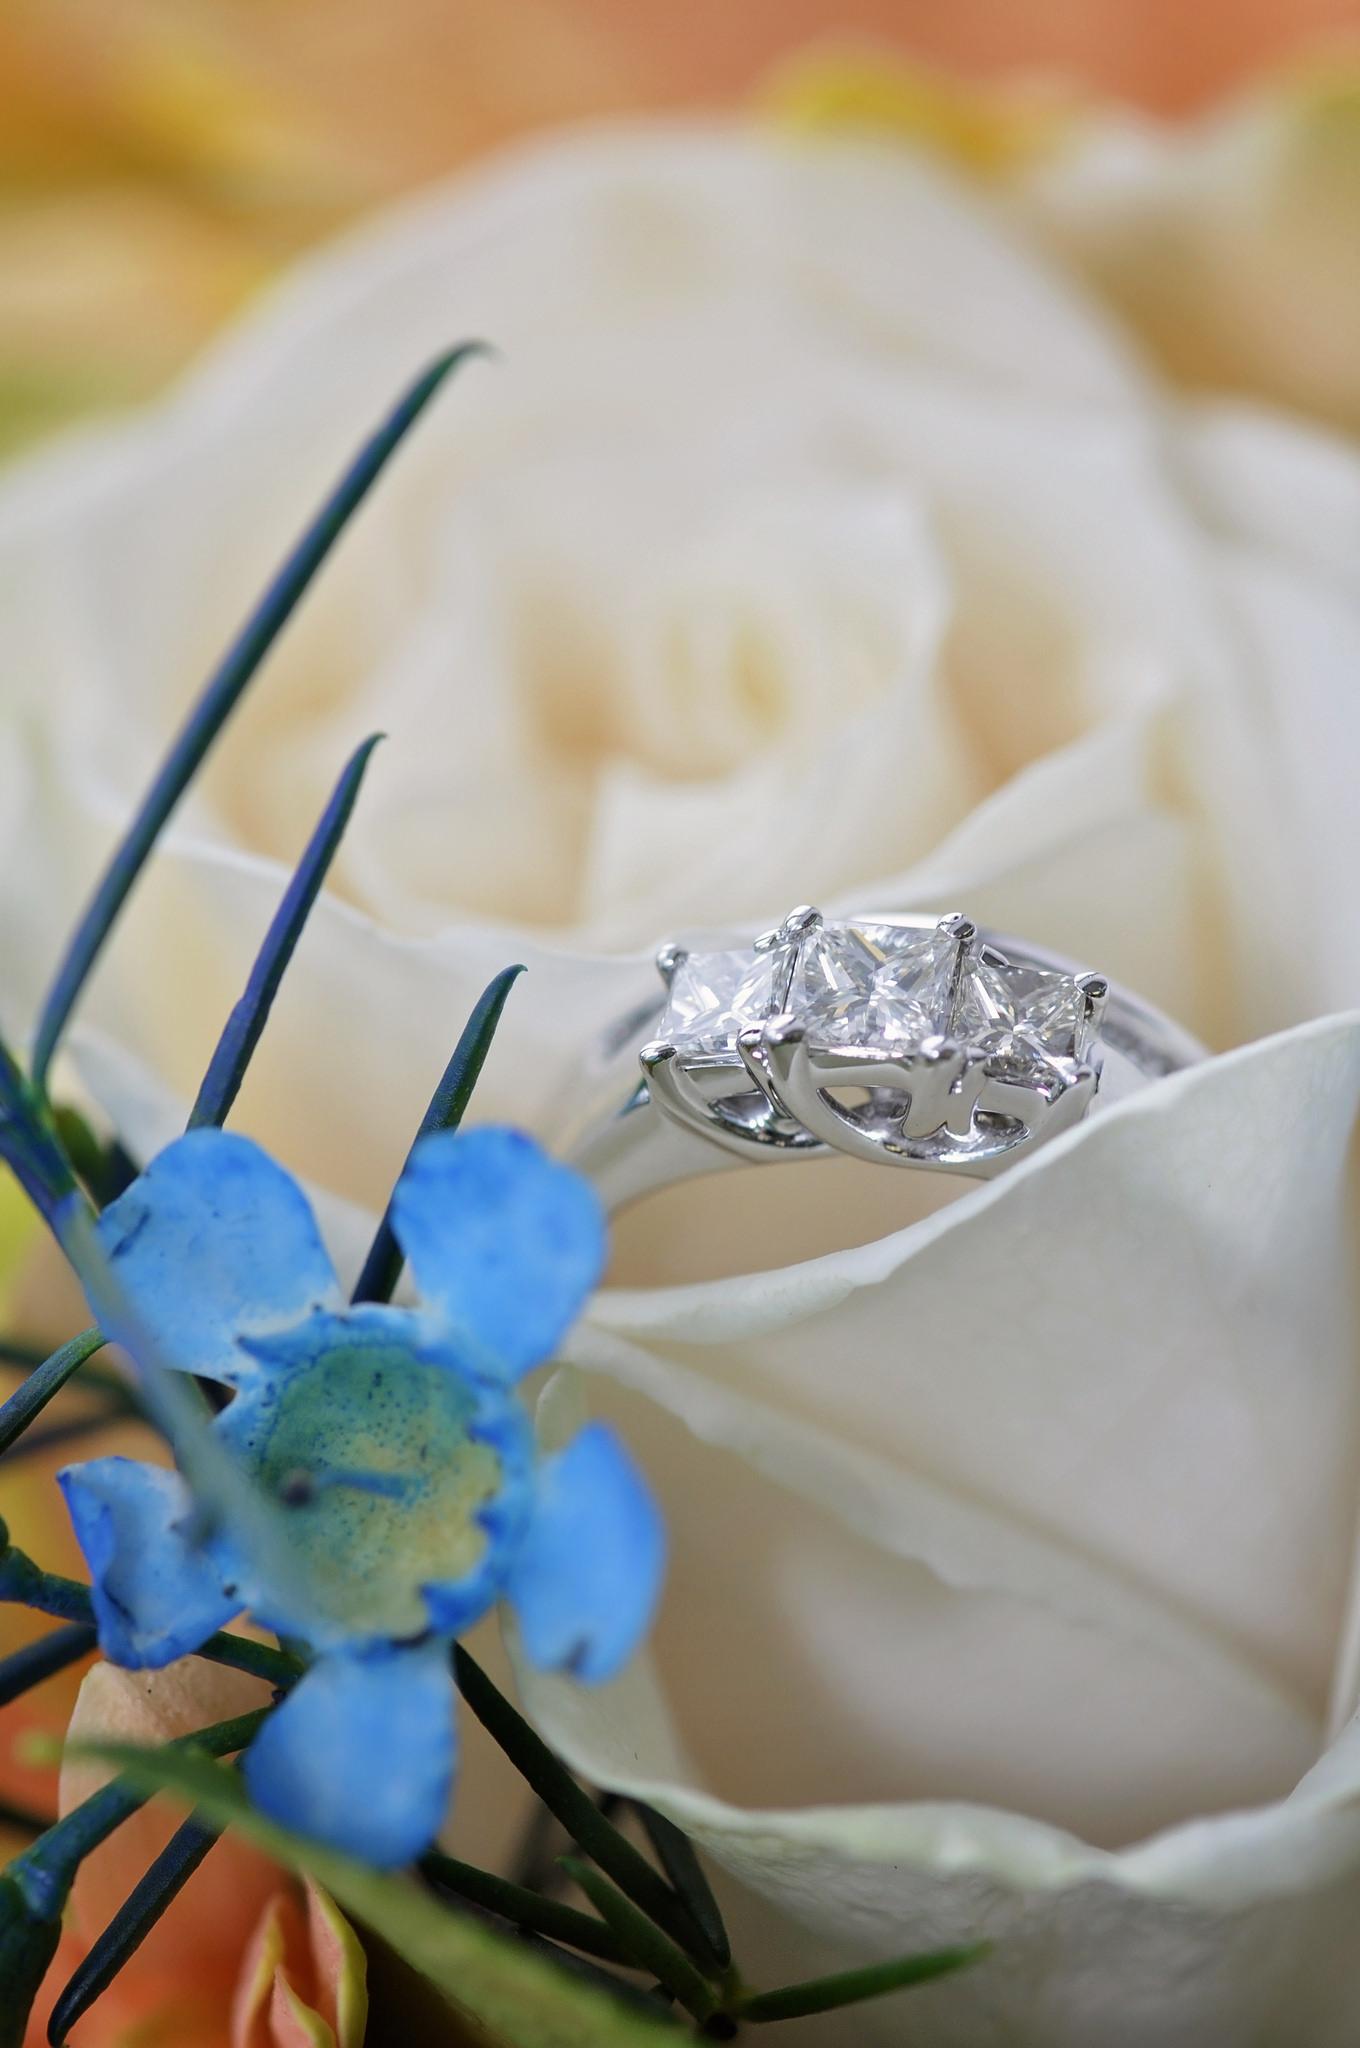 kristine_wedding_rings_spiritedtable_photo06.jpg